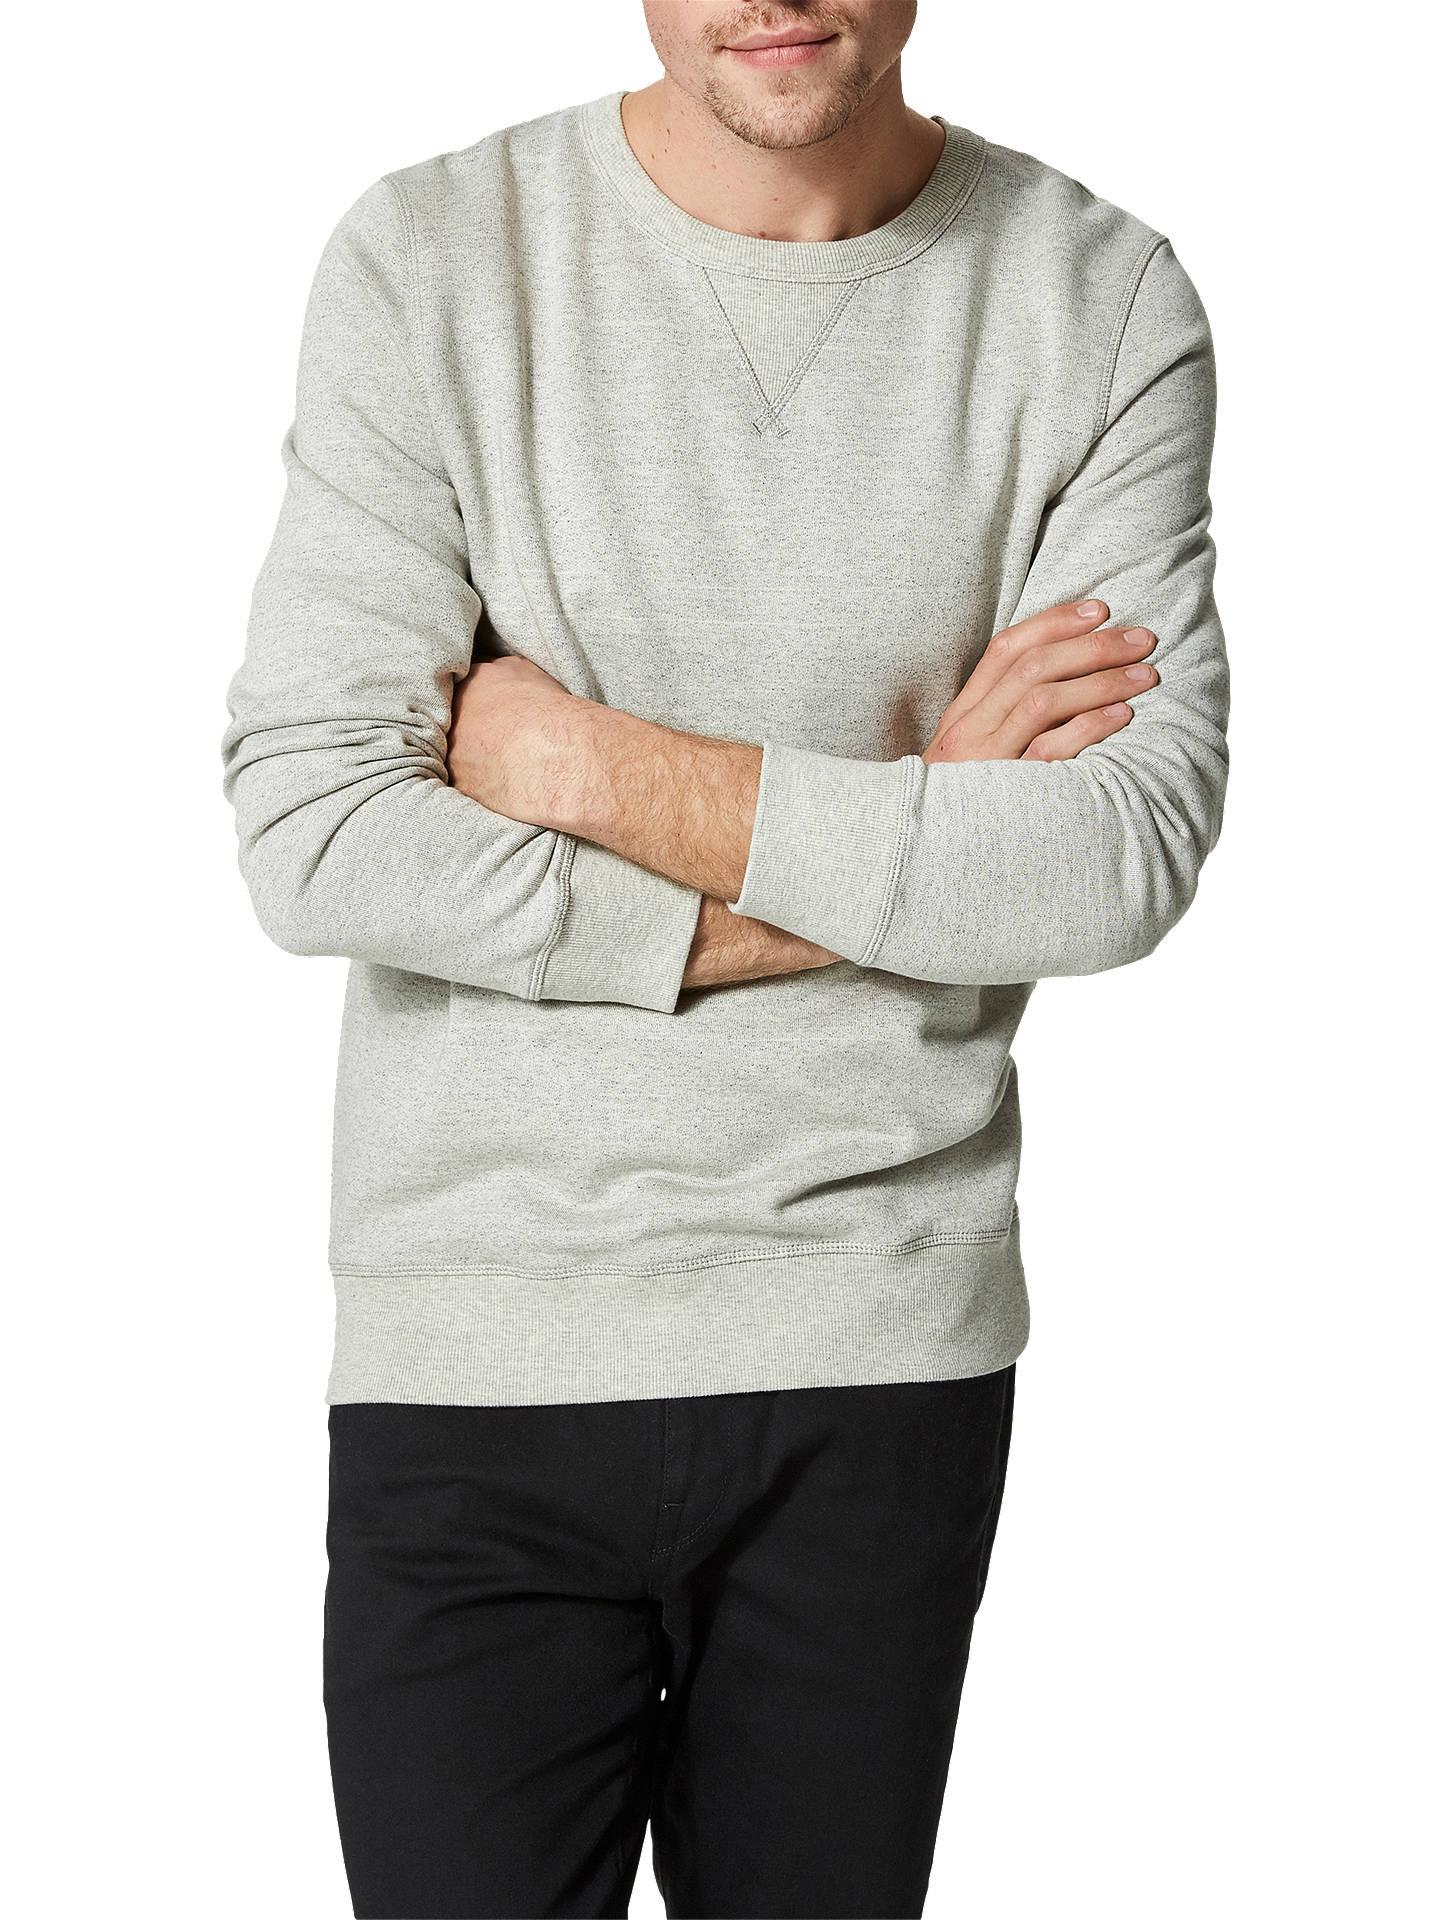 041a5a23b867 Buy SELECTED HOMME Shhsimon Basic Sweatshirt, Light Grey Melange, S Online  at johnlewis.